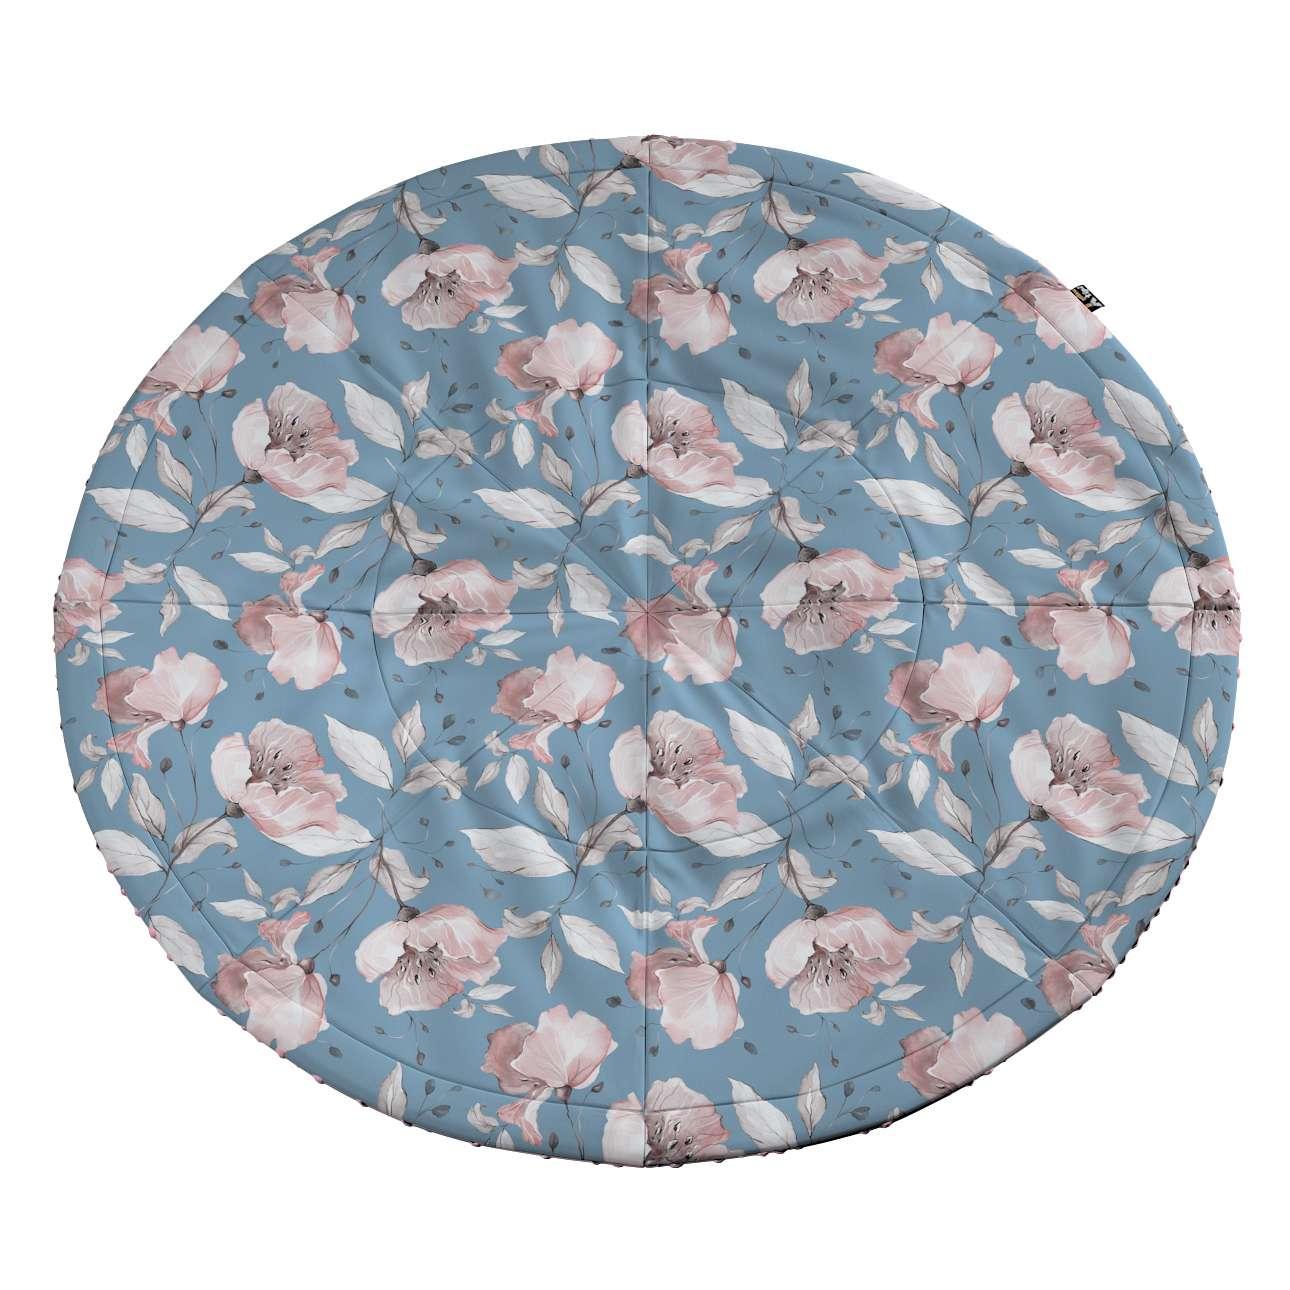 Apvalus kilimėlis kolekcijoje Magic Collection, audinys: 500-18